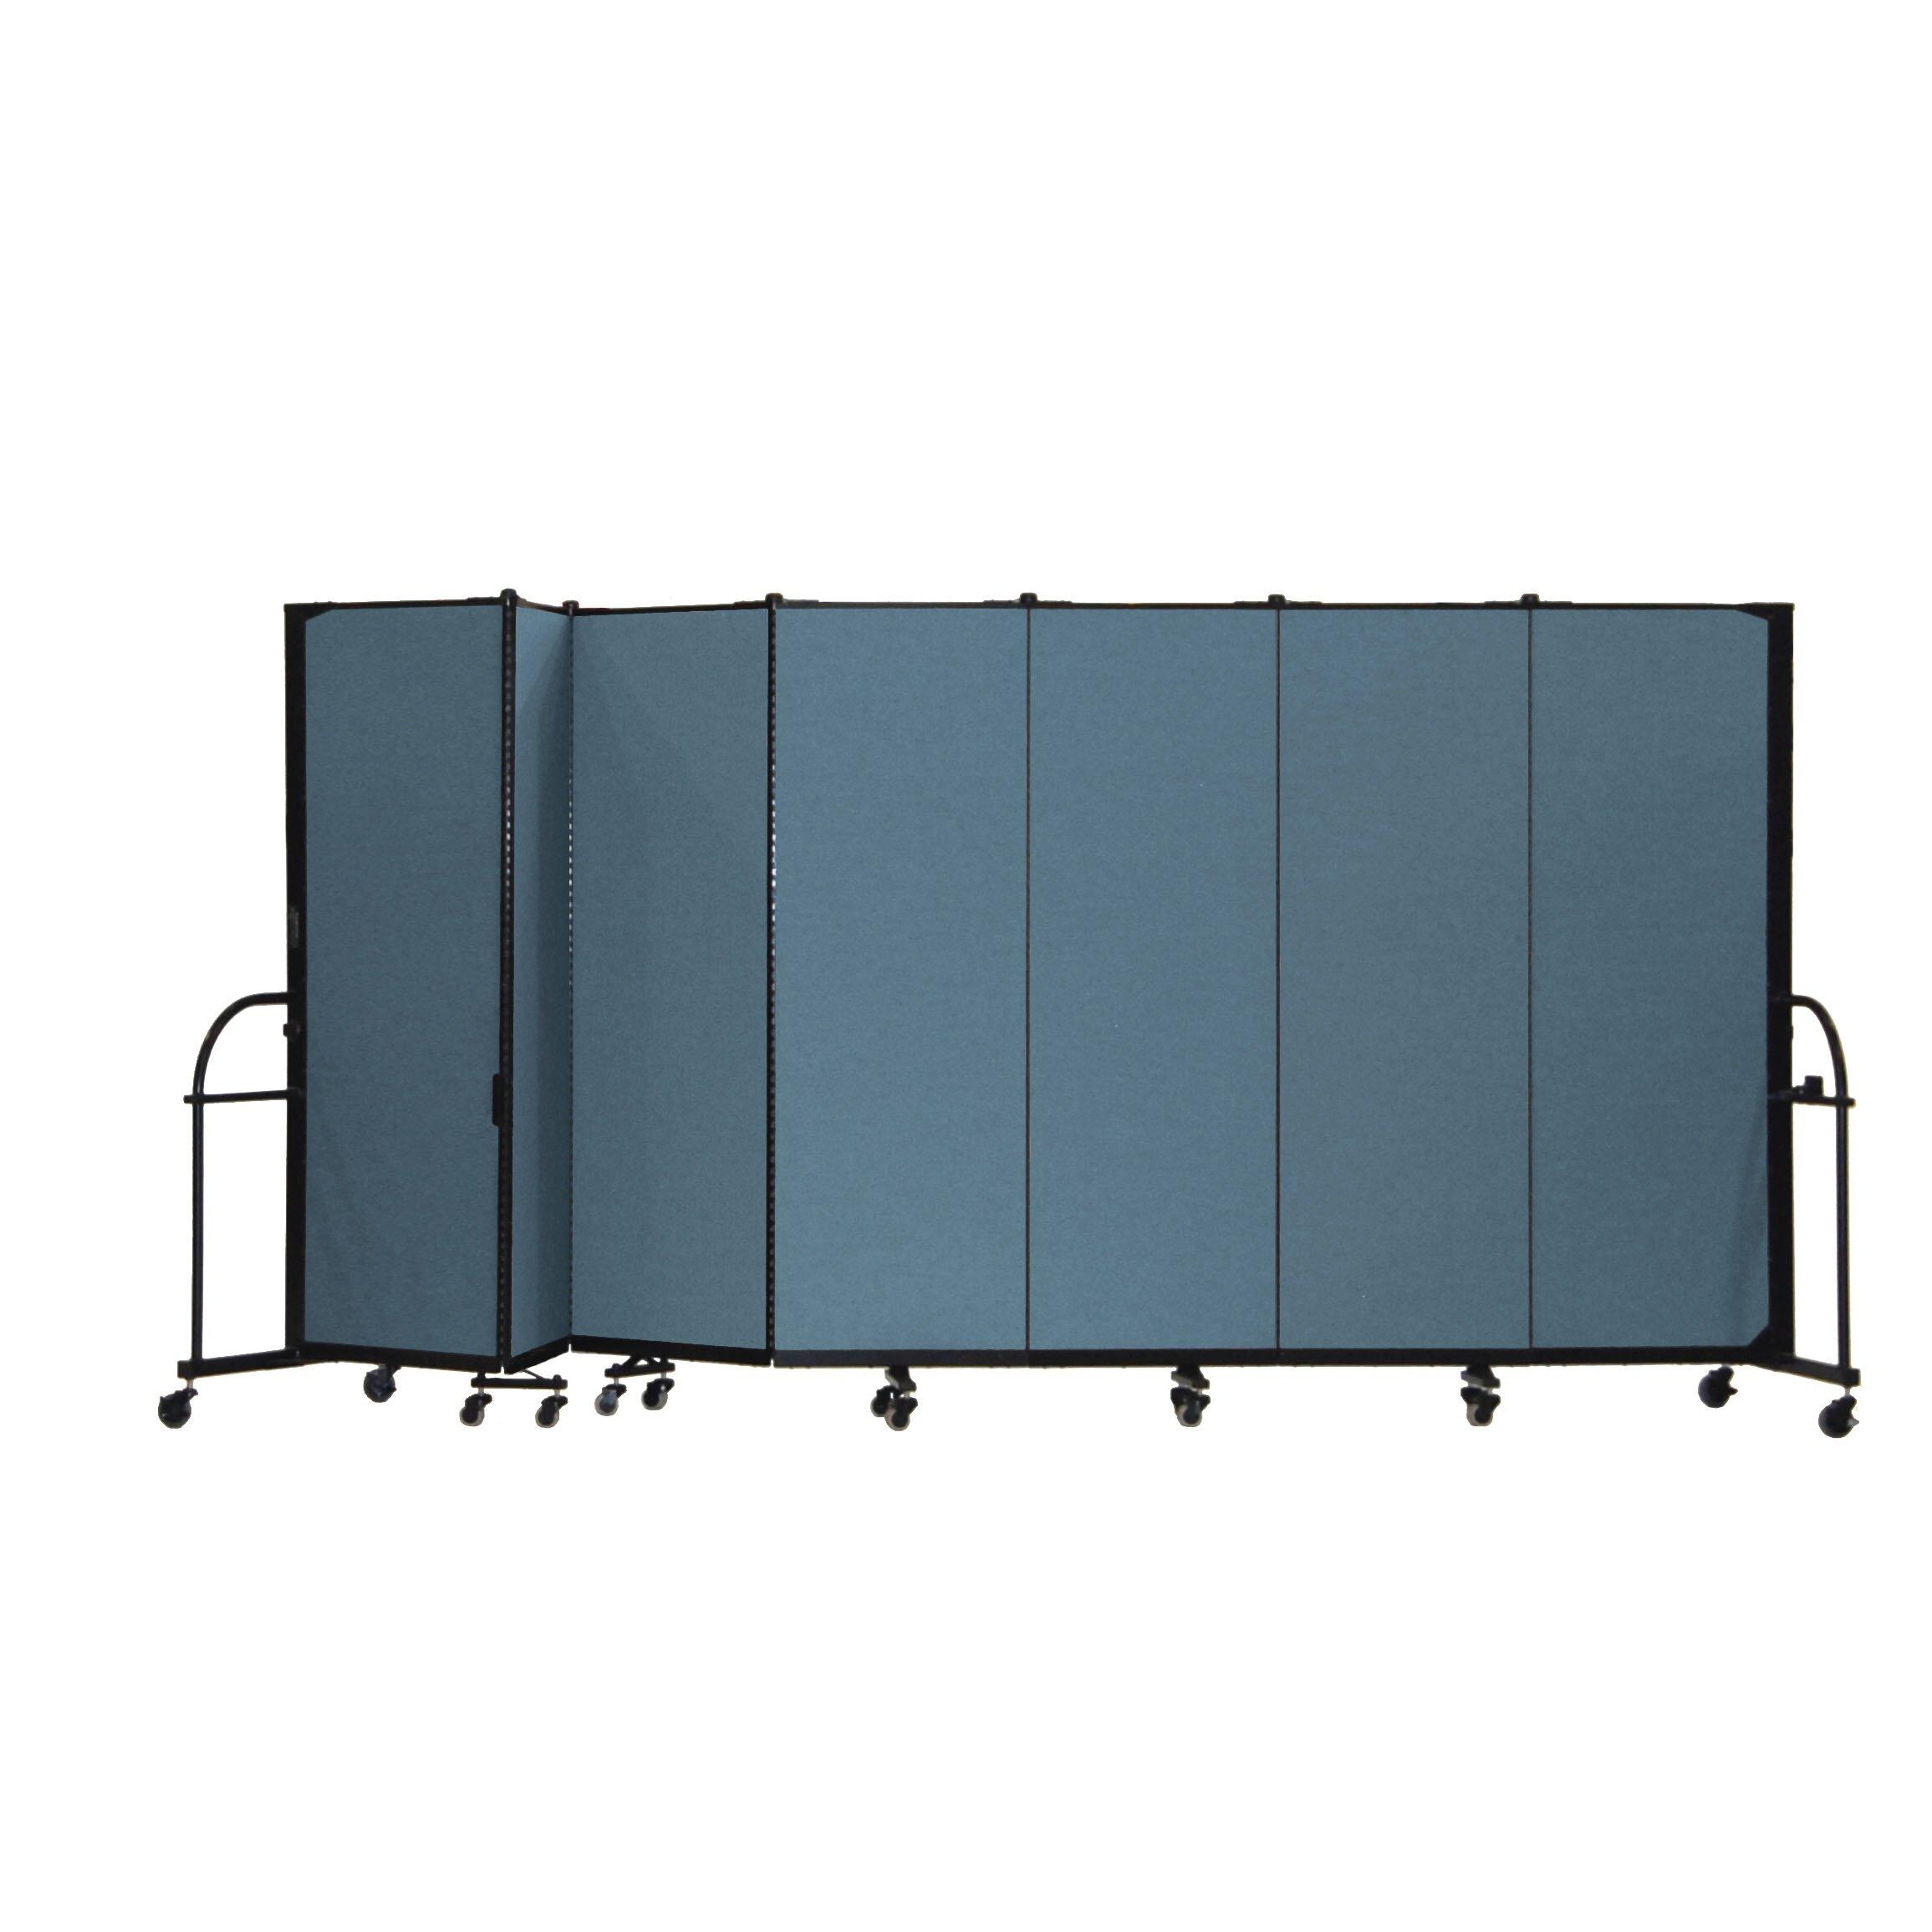 Heavy Duty Seven Panel Portable Room Divider Wayfair Supply